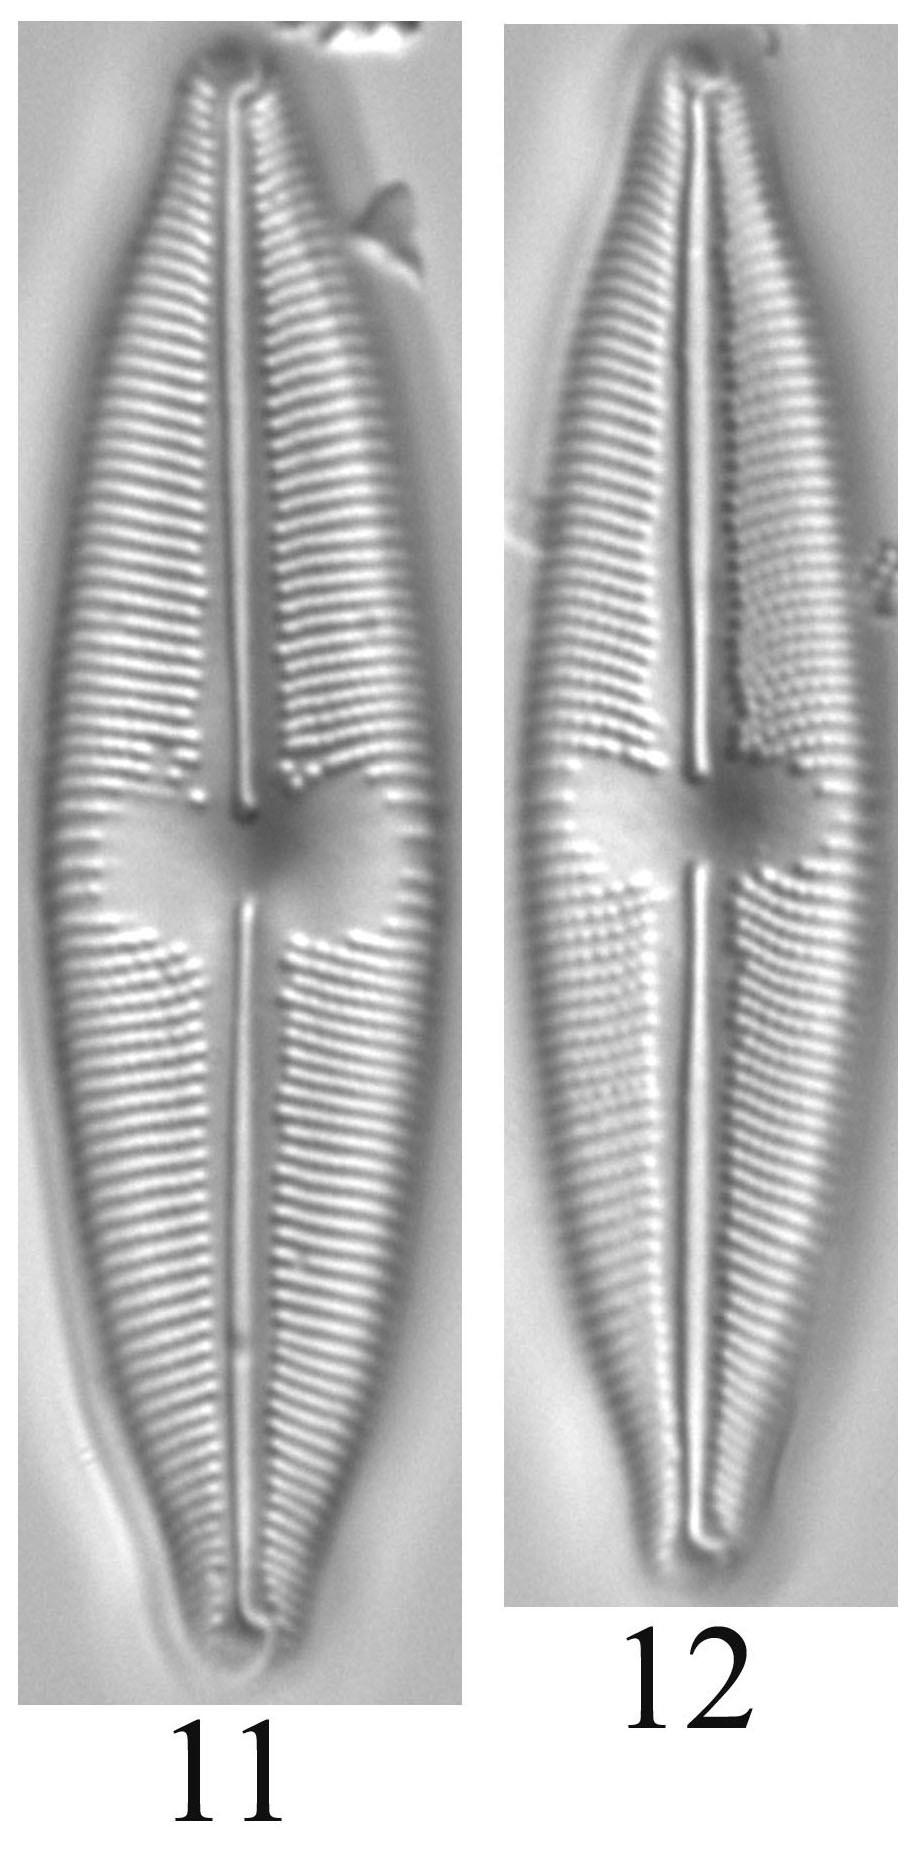 Cymbopleura Laszlorum Orig Imag 2